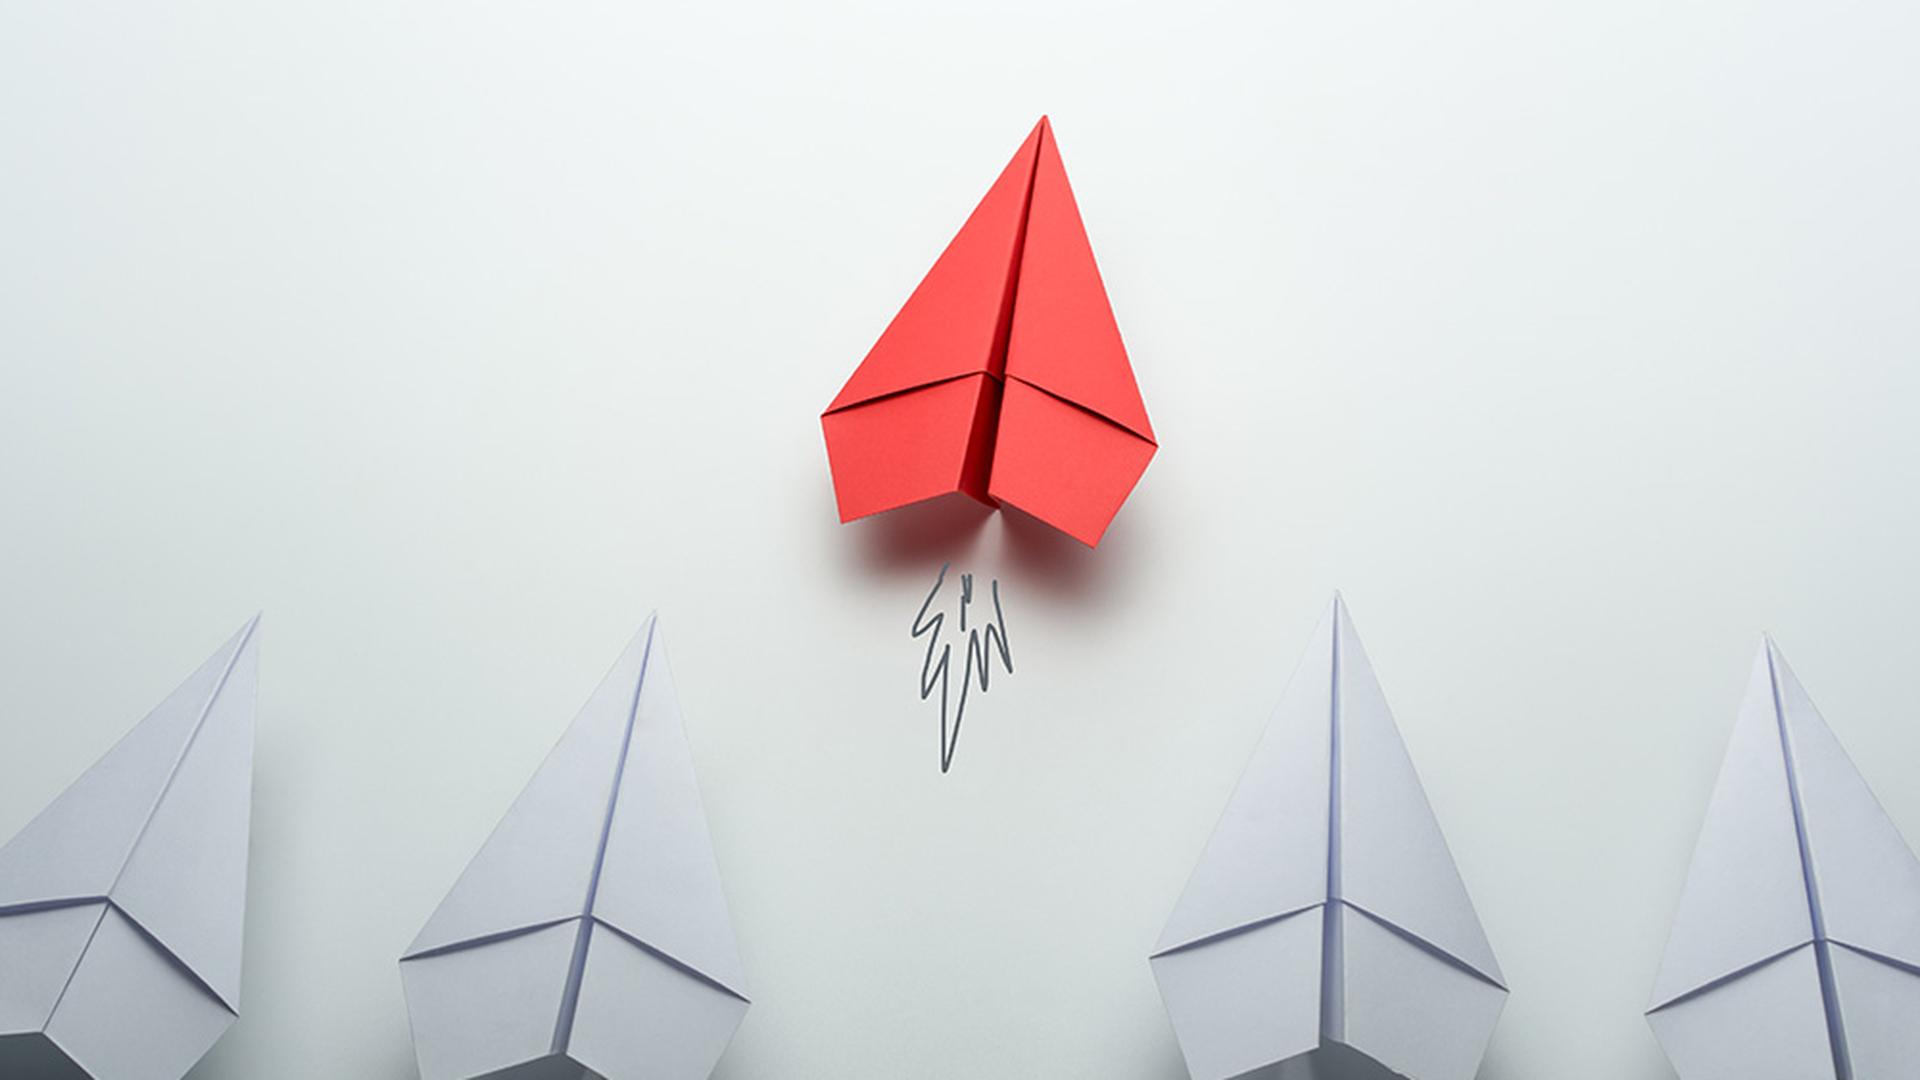 LINK Mobility - RCS Evolution oder Revolution Papierflieger startet durch